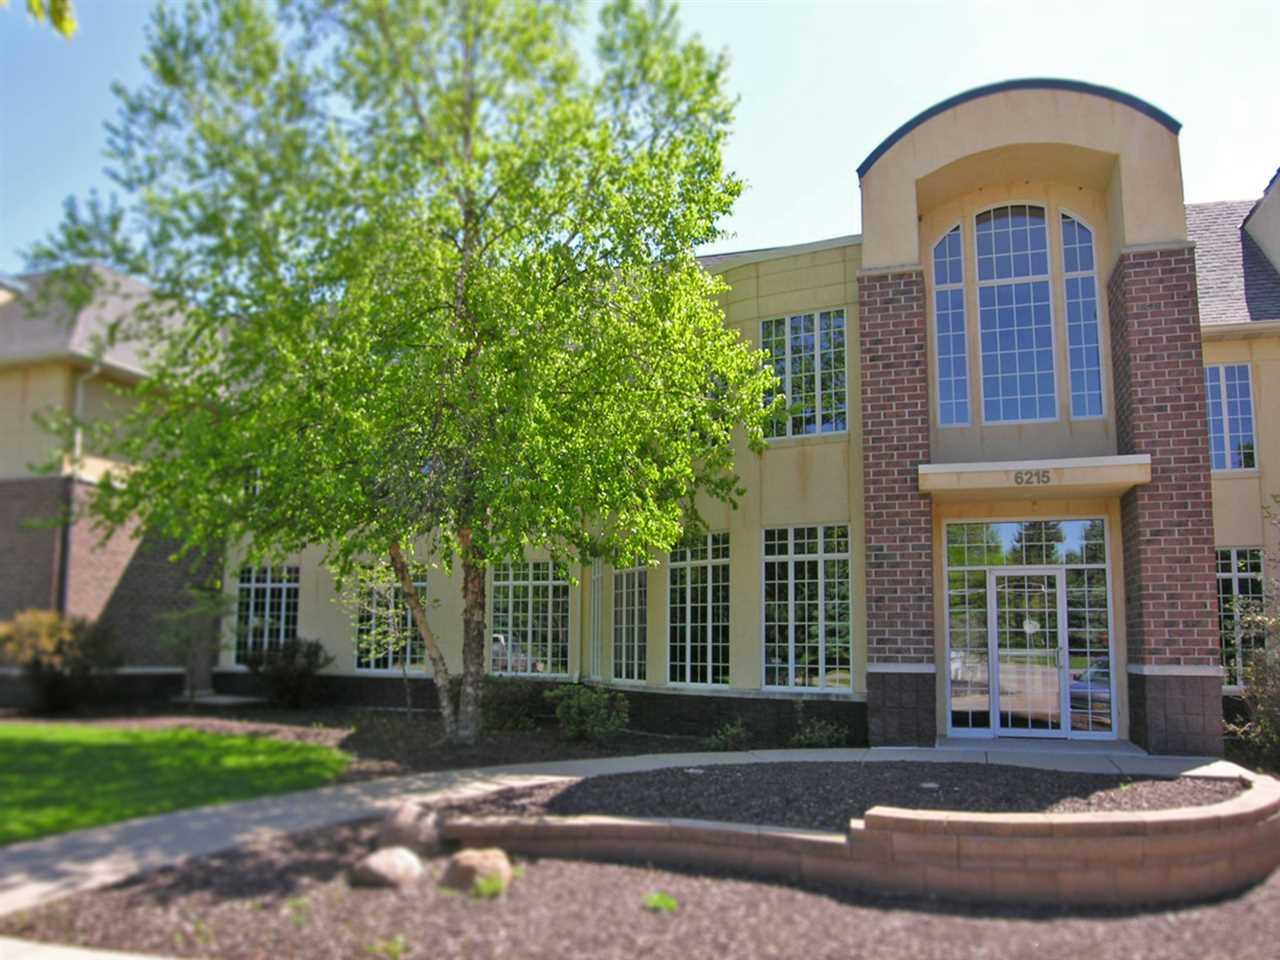 Real Estate for Sale, ListingId: 31351639, Davenport,IA52807